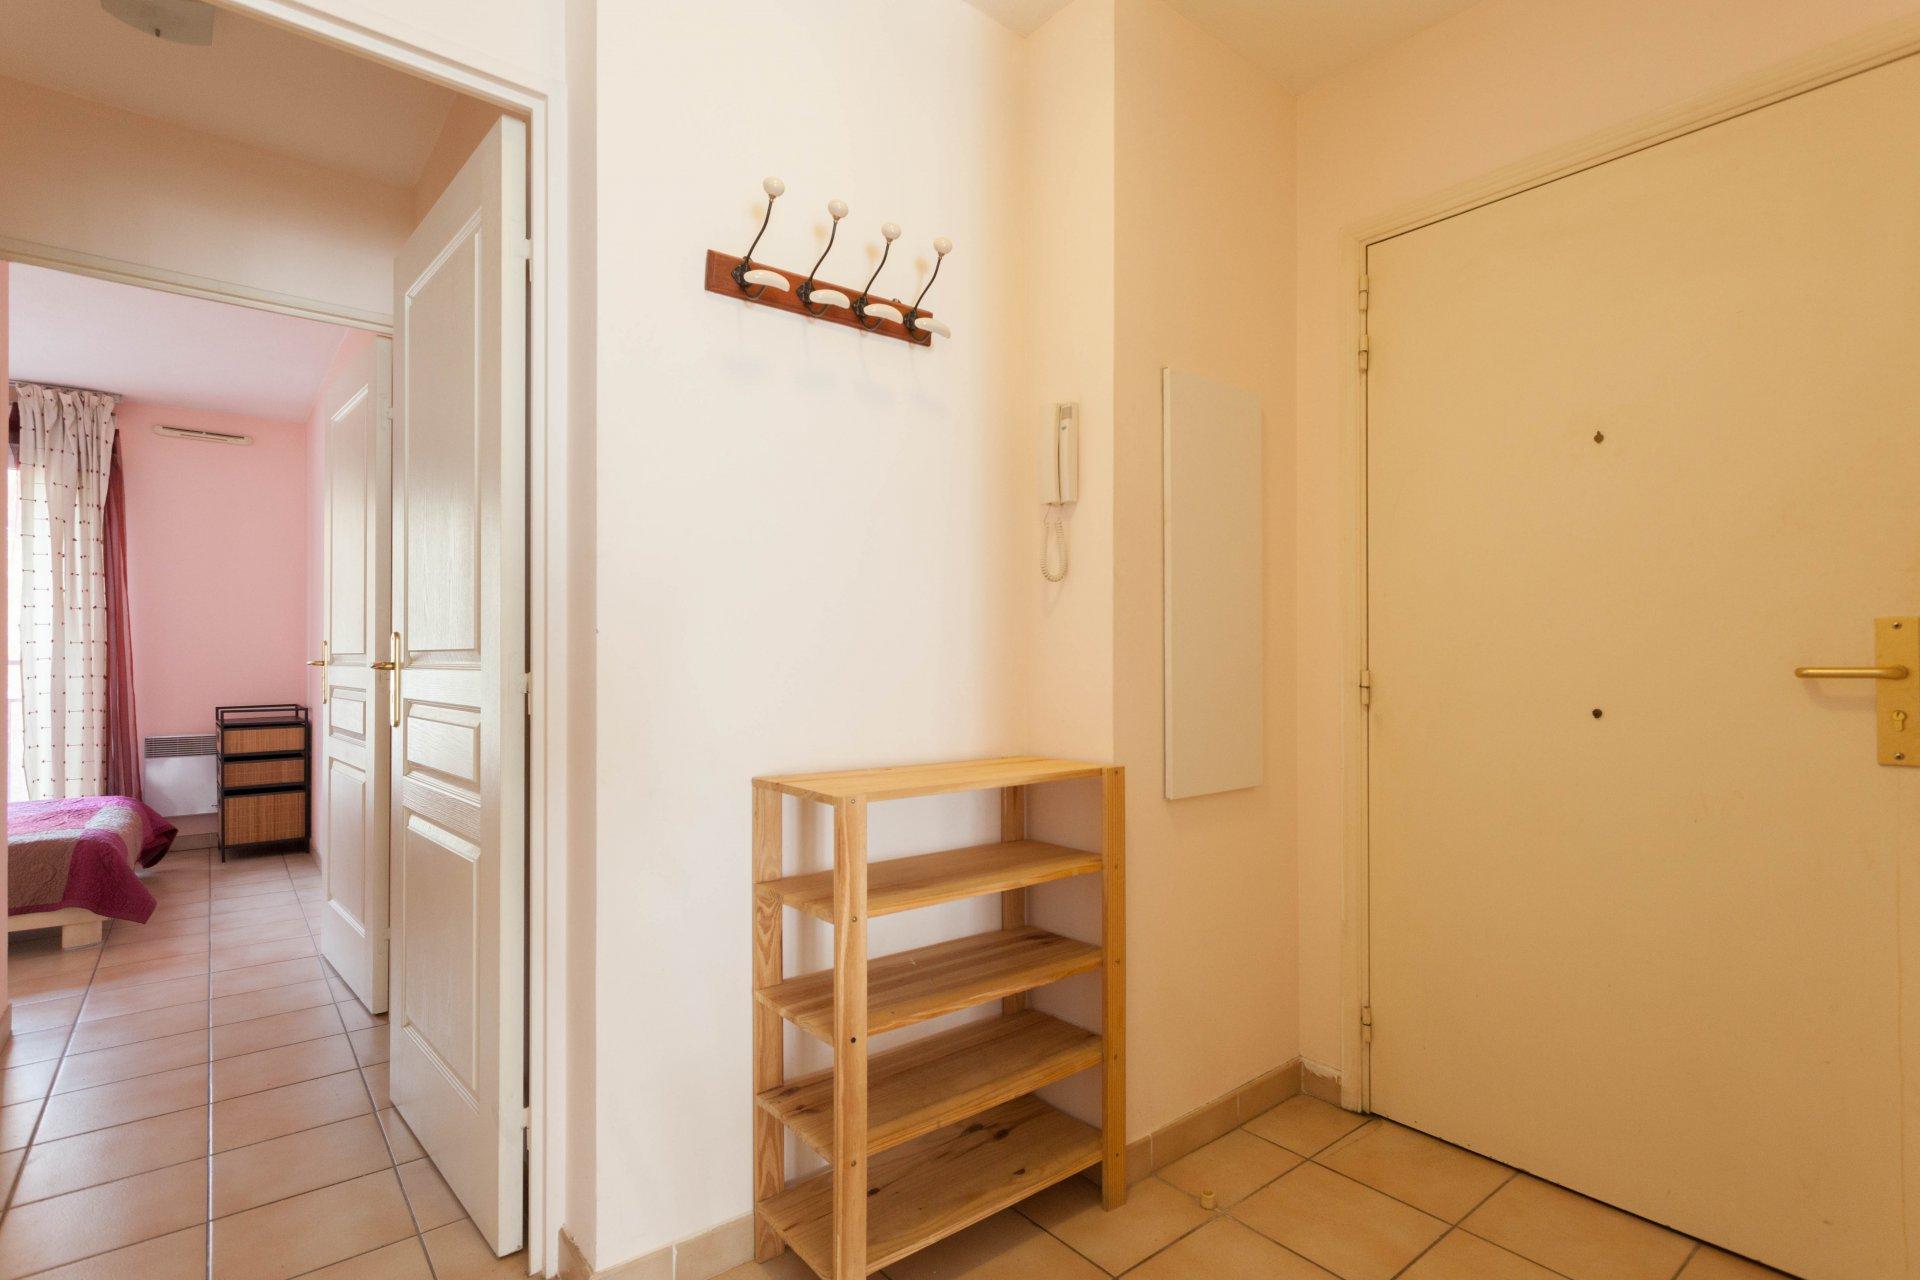 Appartement 2 pieces, Nice Carabacel